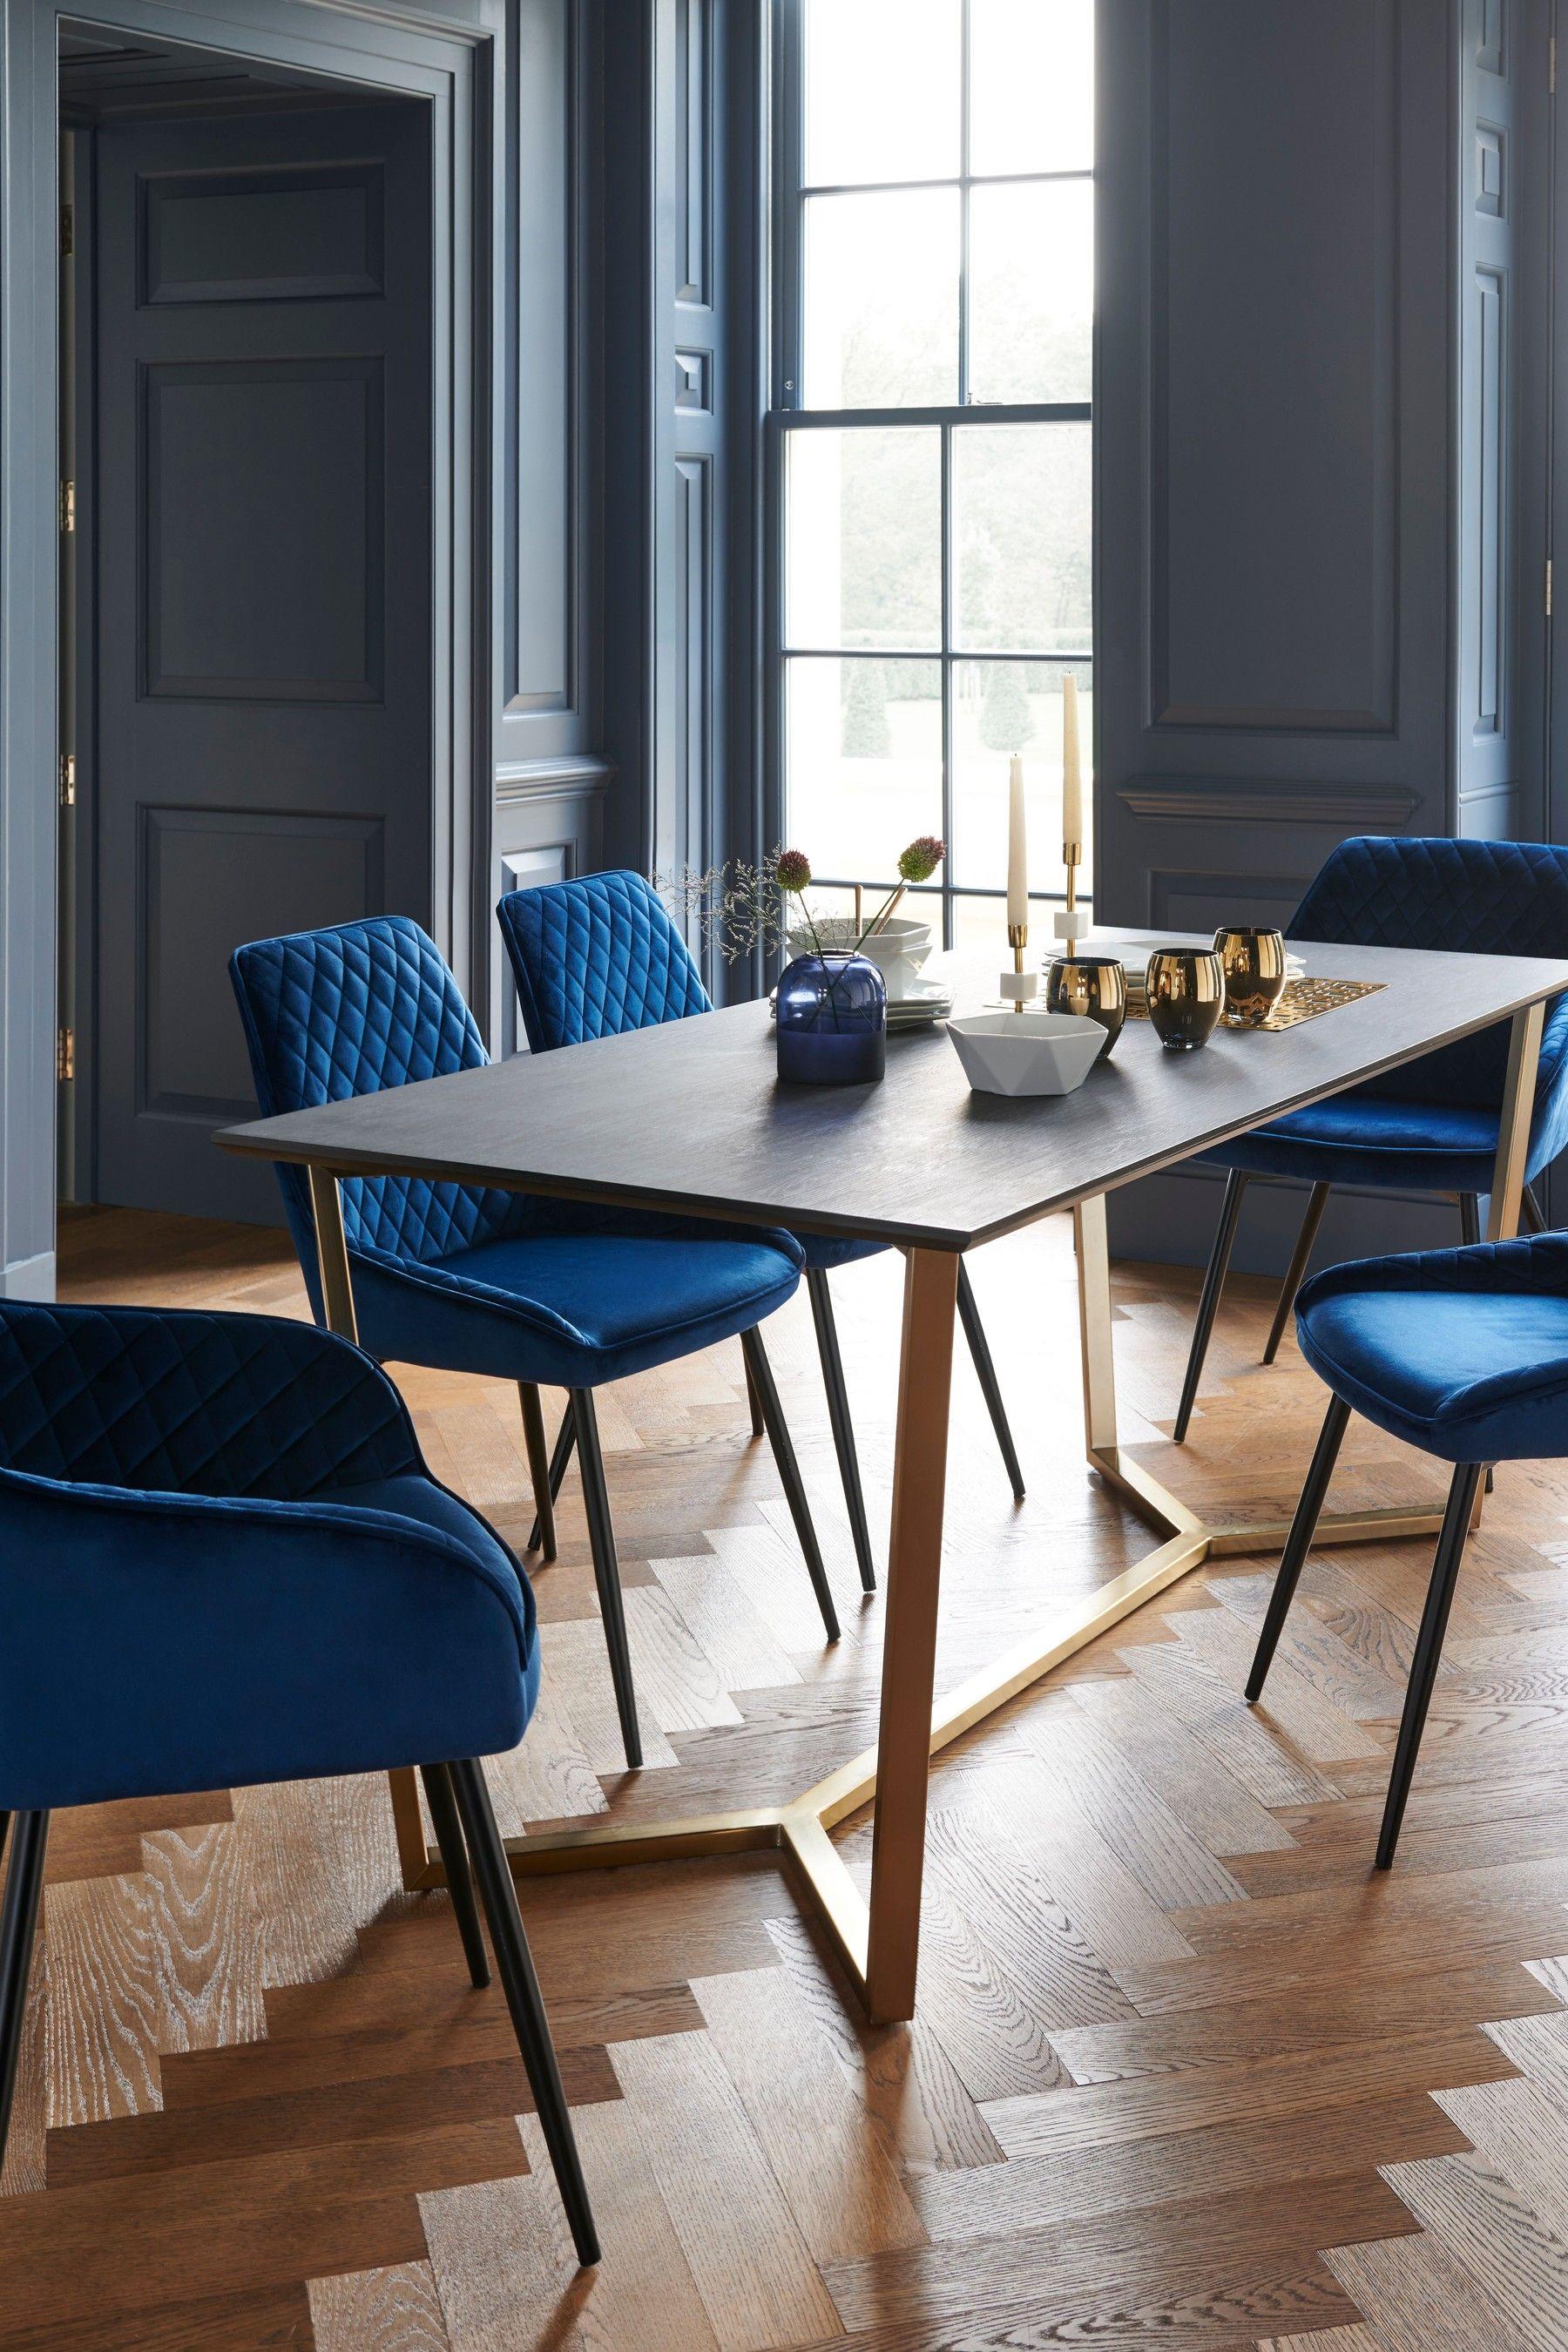 Next Venetia Black Dining Table   Black   Round dining table sets ...